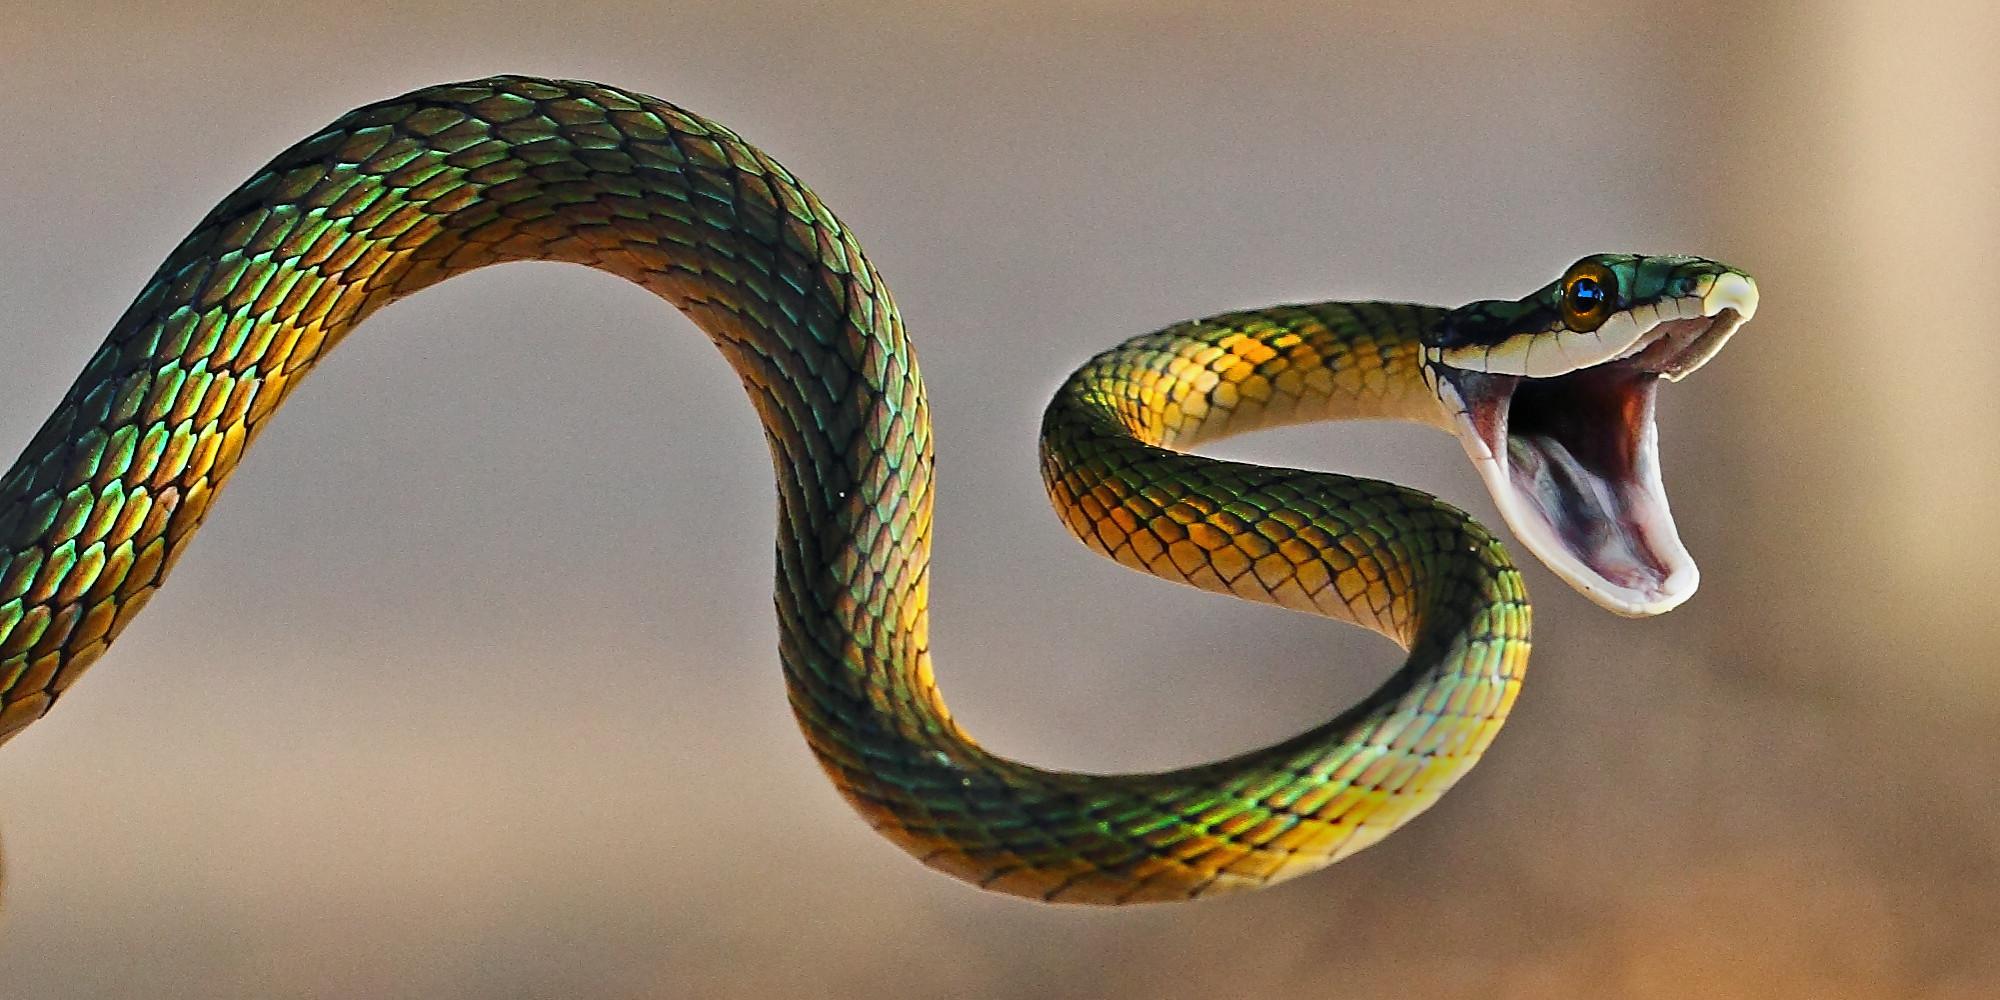 snake - photo #3